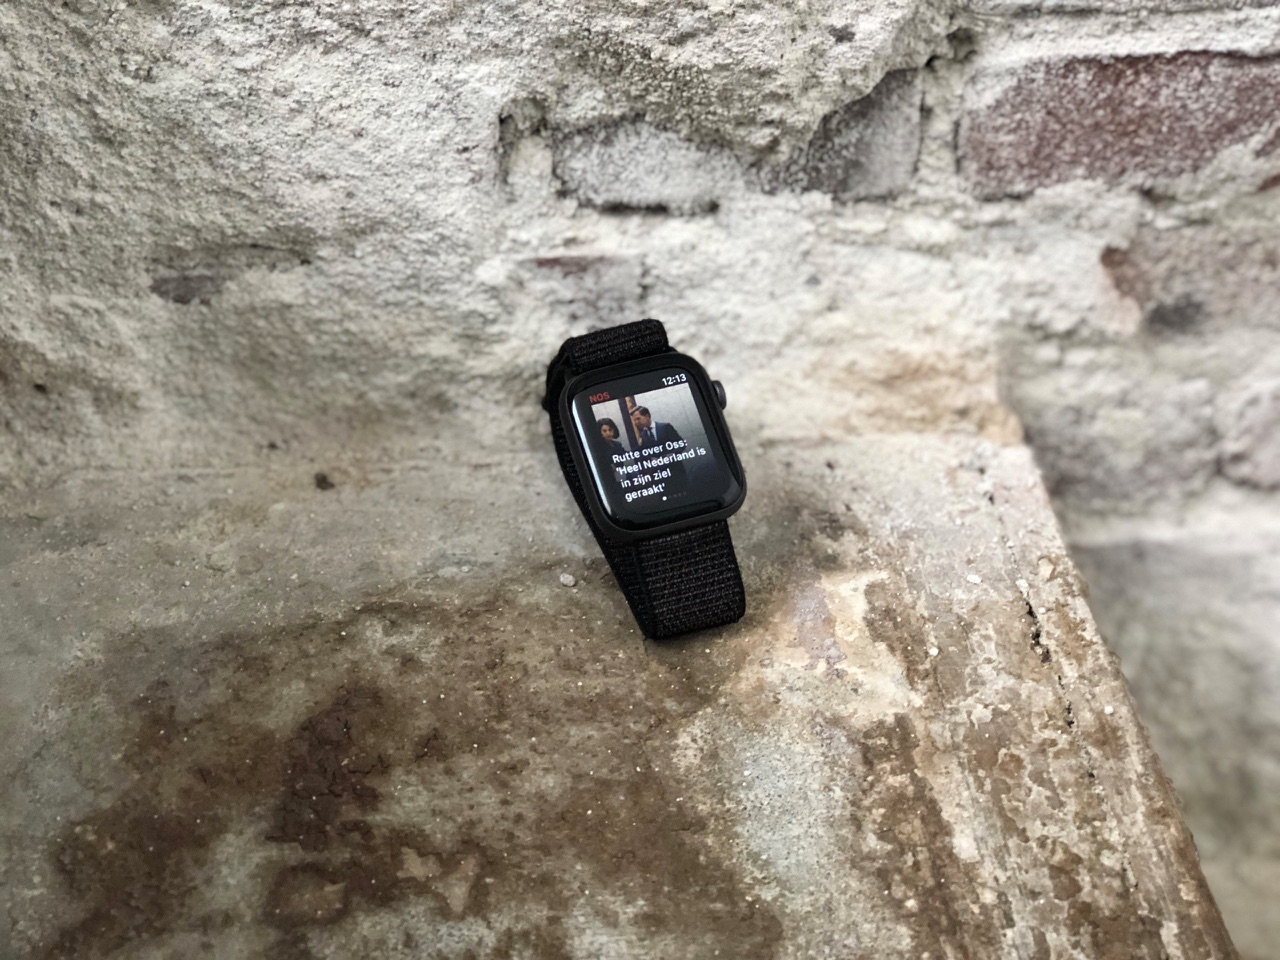 Apple Watch Series 4 met onaangepaste app.